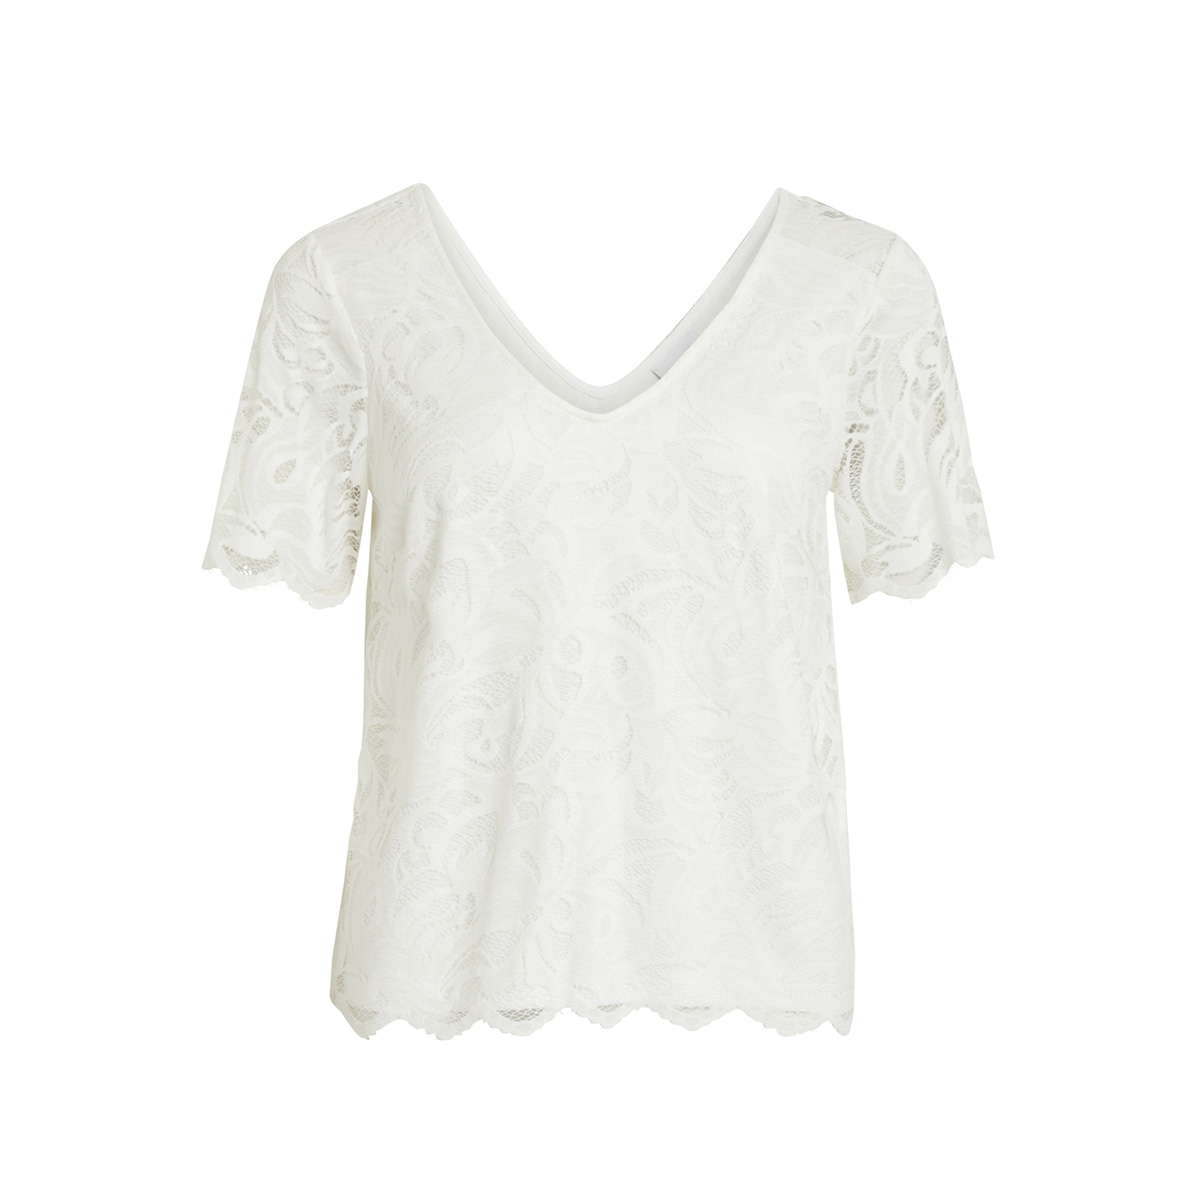 vidaimy s/s t-shirt tb 14051848 vila t-shirt cloud dancer